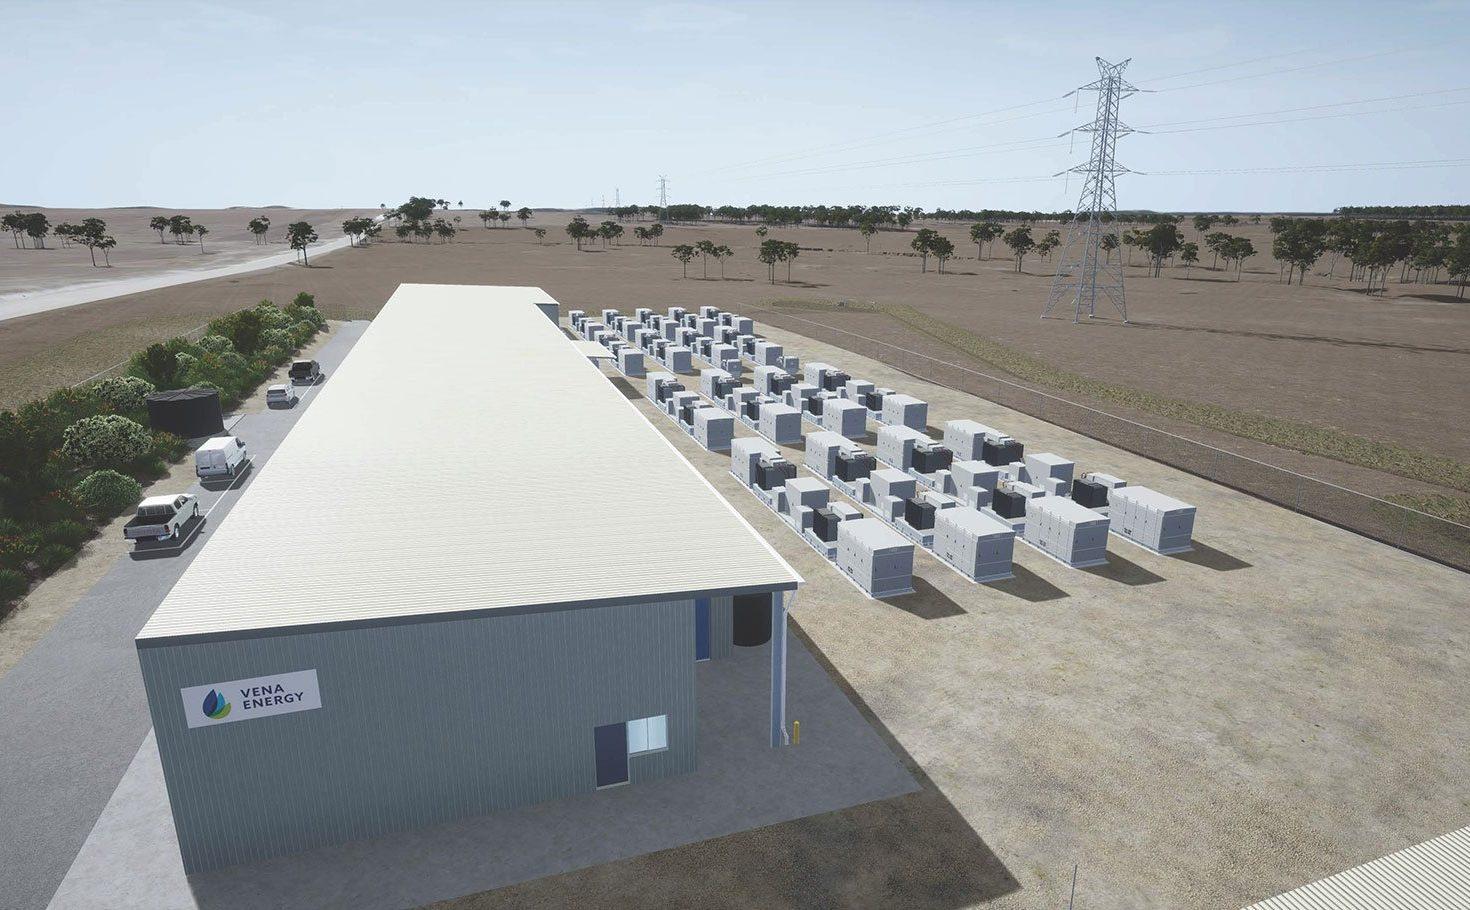 cib_Australias-Sunshine-State-turns-to-batteries